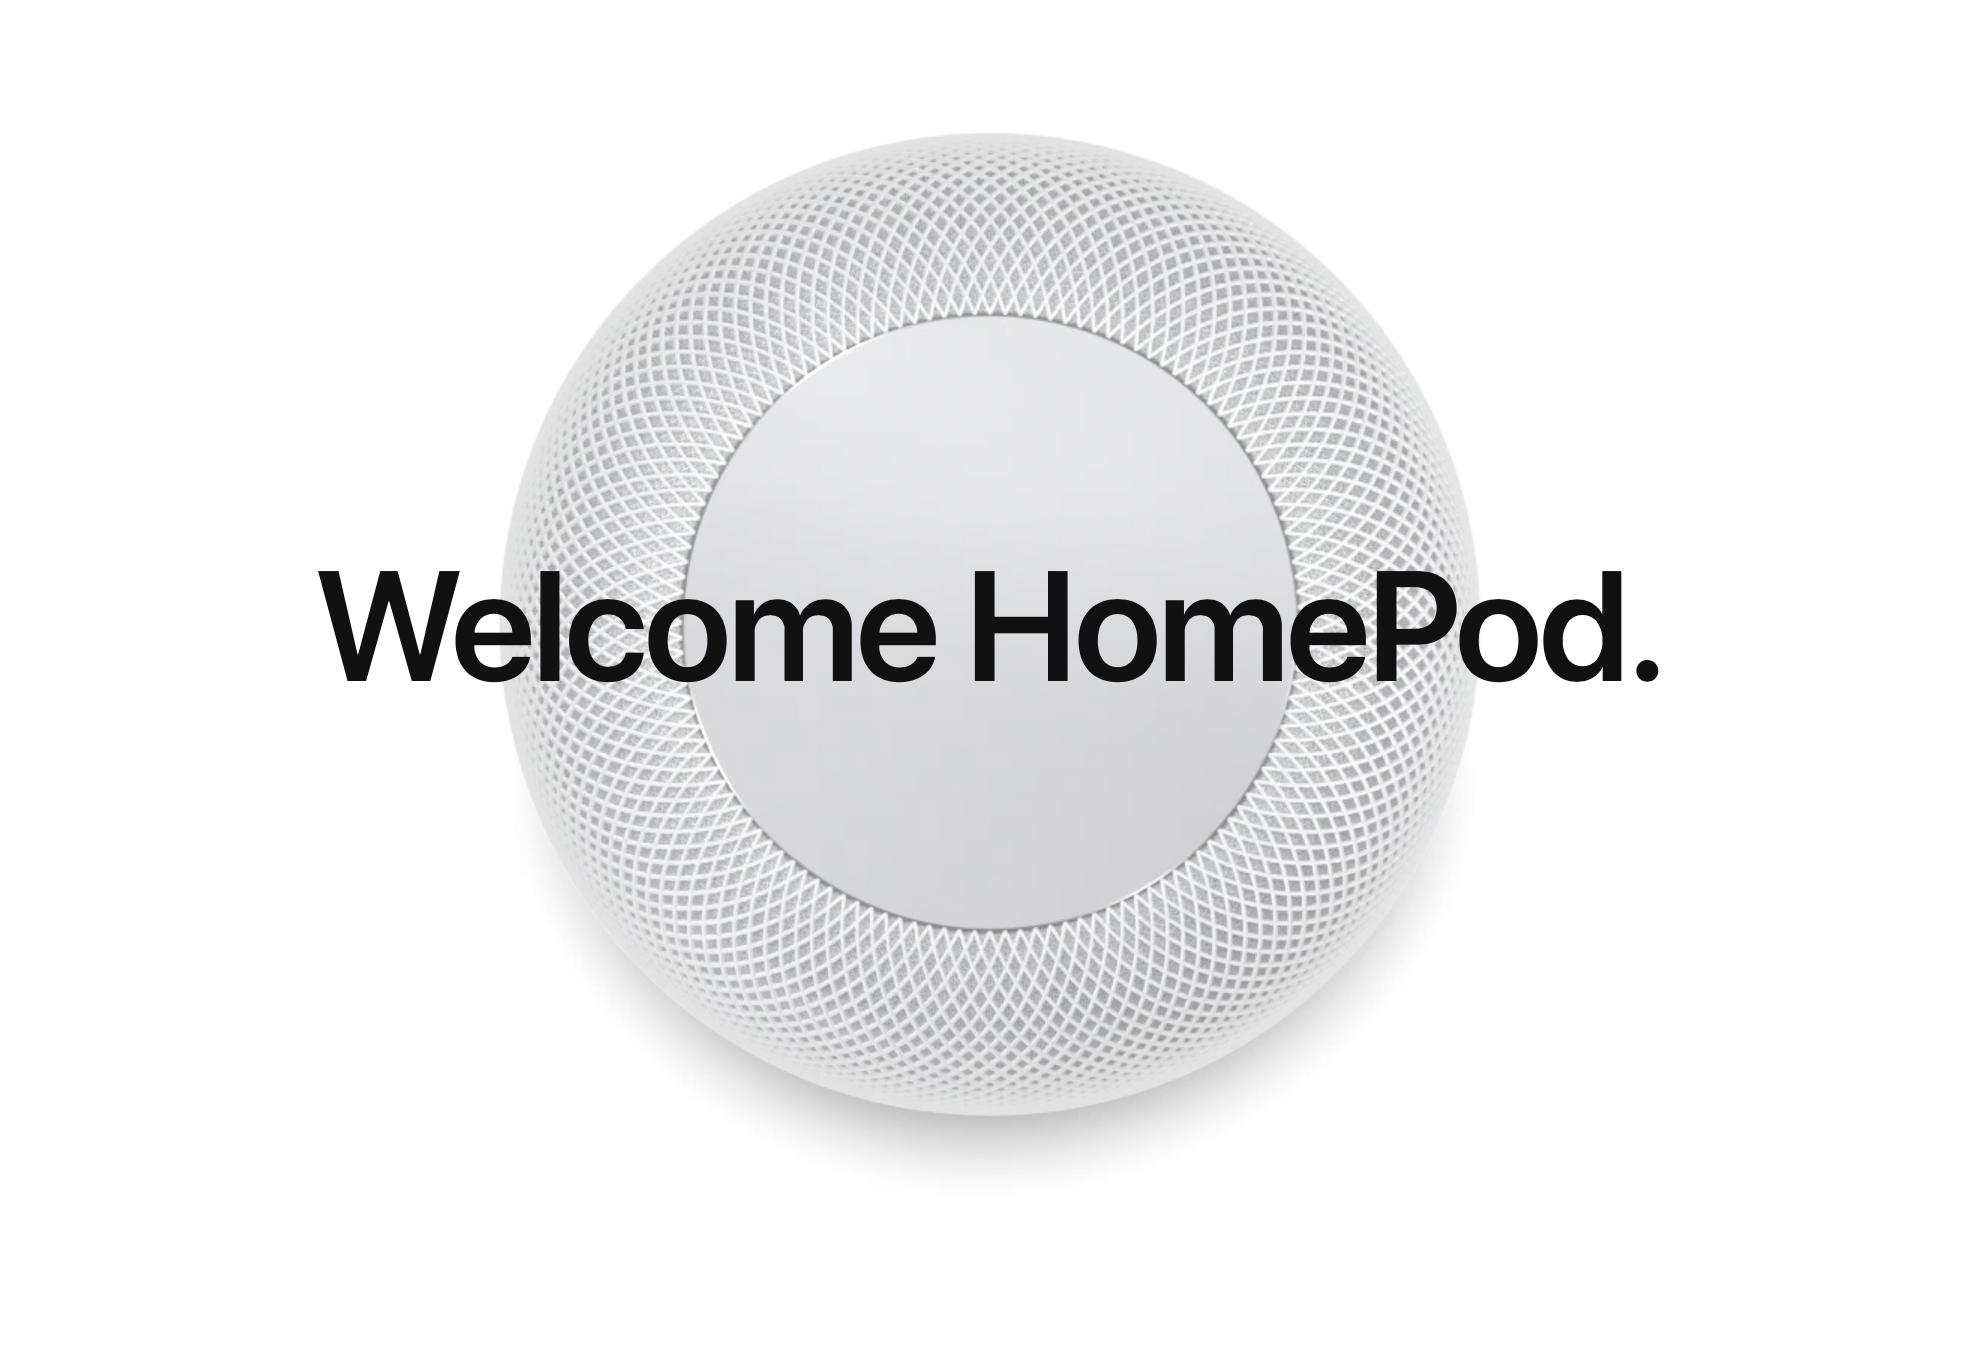 HomePod 스피커 발표 – WWDC 2017